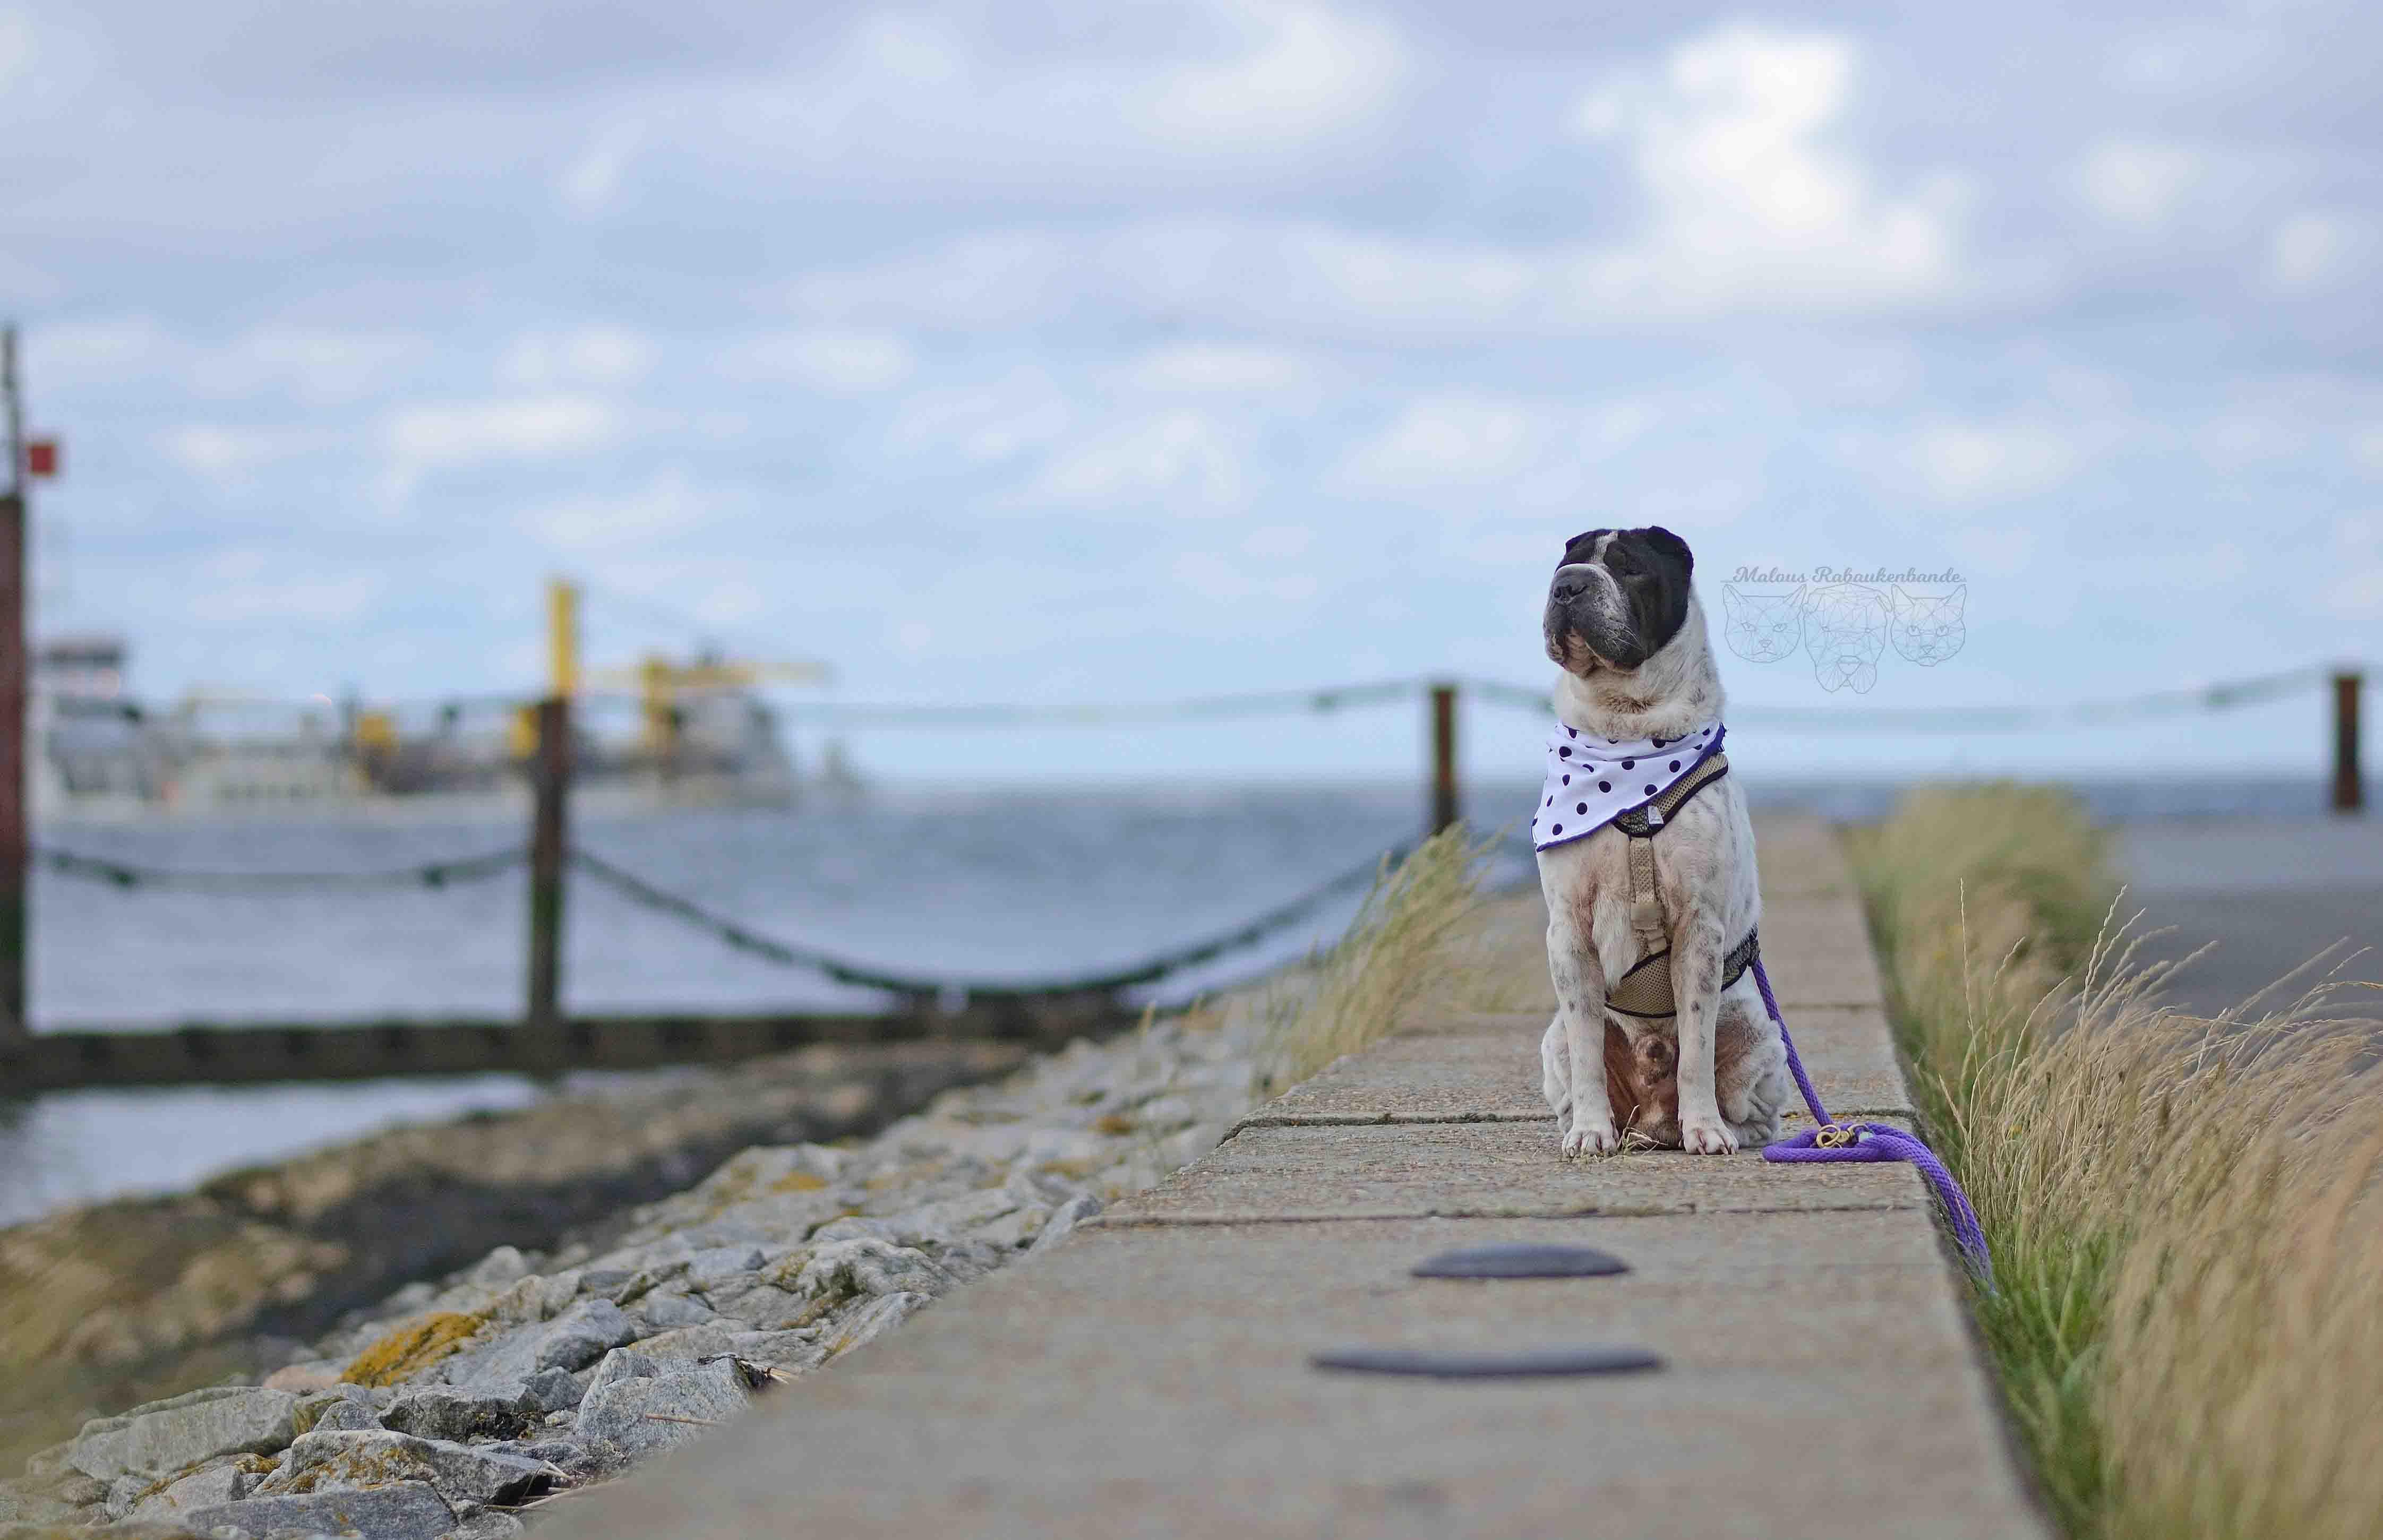 Kingston a Cuxhaven Hunde Hund Strand blog Rabaukenbande Schloss Urlaub Meinung Fazit Bewertung Nordsee Shar Pei Teich Watt Meer Park Fotografie Hafen Alte Liebe Sahlenburg Familie